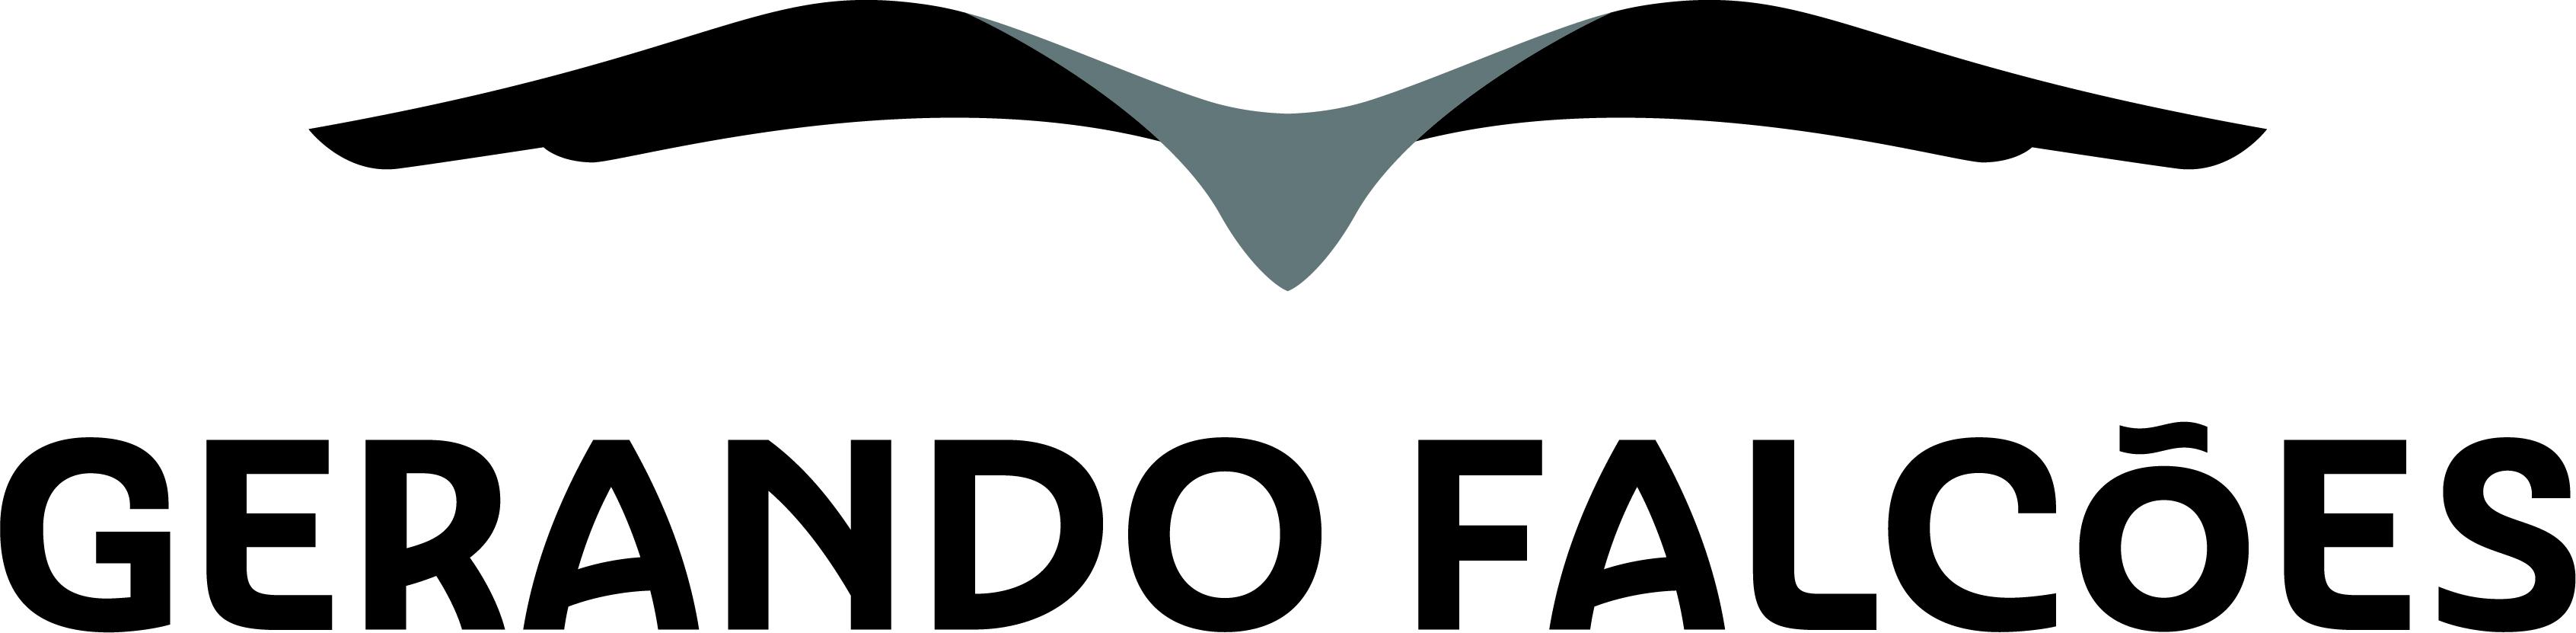 AF_Logo_Gerando_Falcoes-CMYK_1_-_Eliziane_Vezzosi